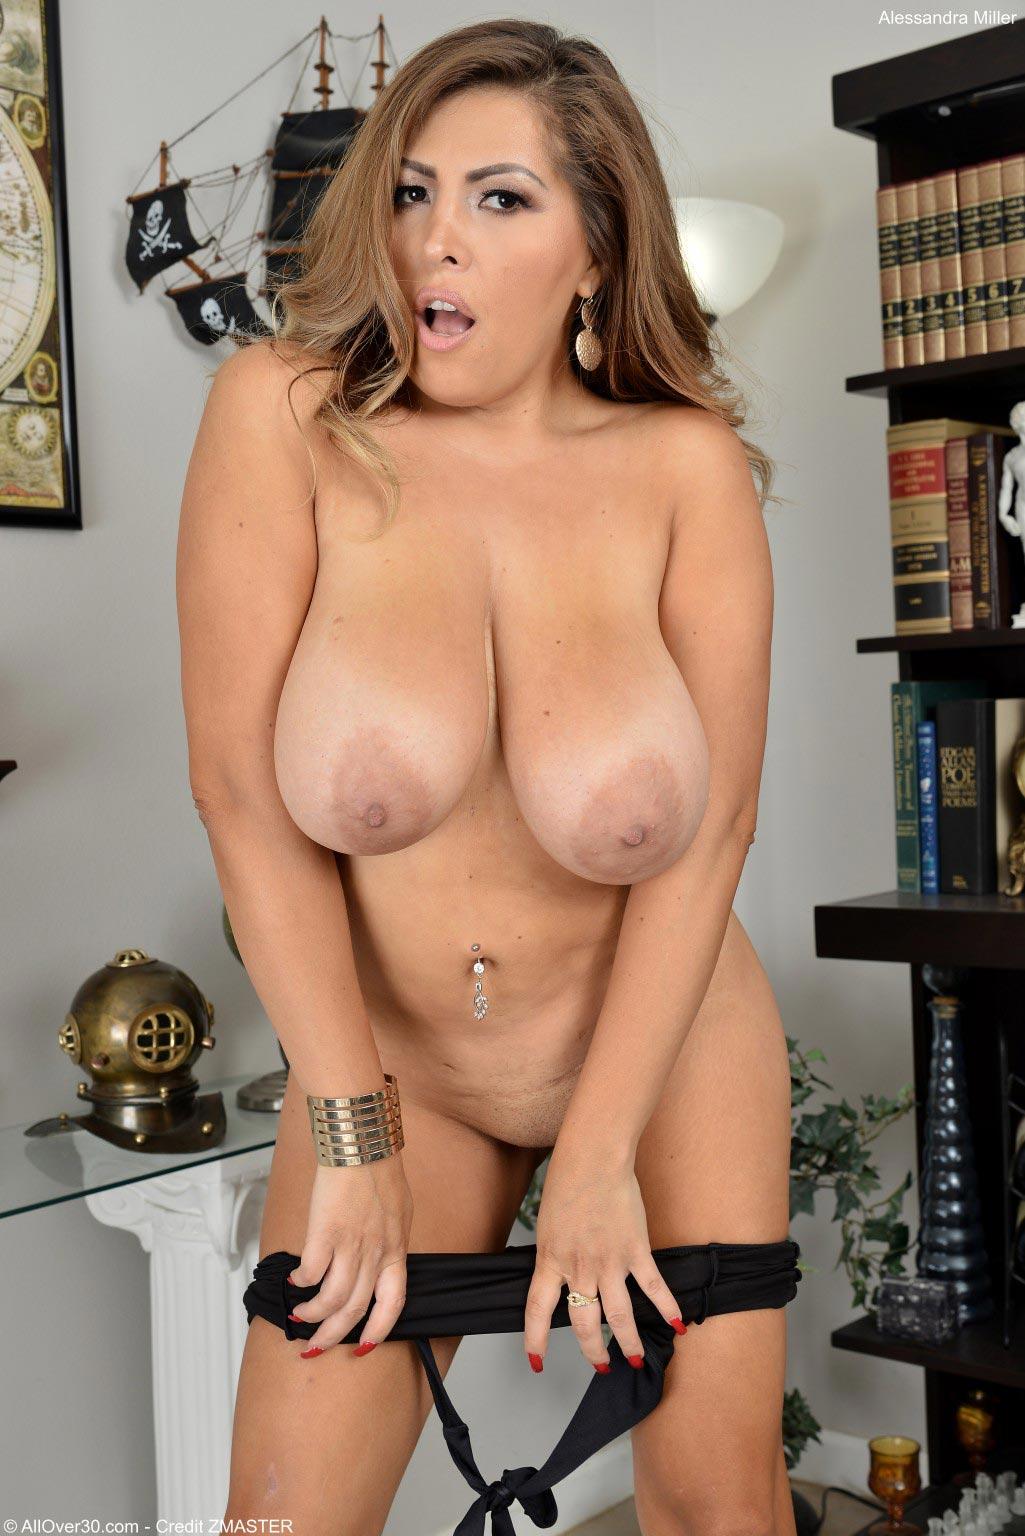 Alessandra Miller Freeones